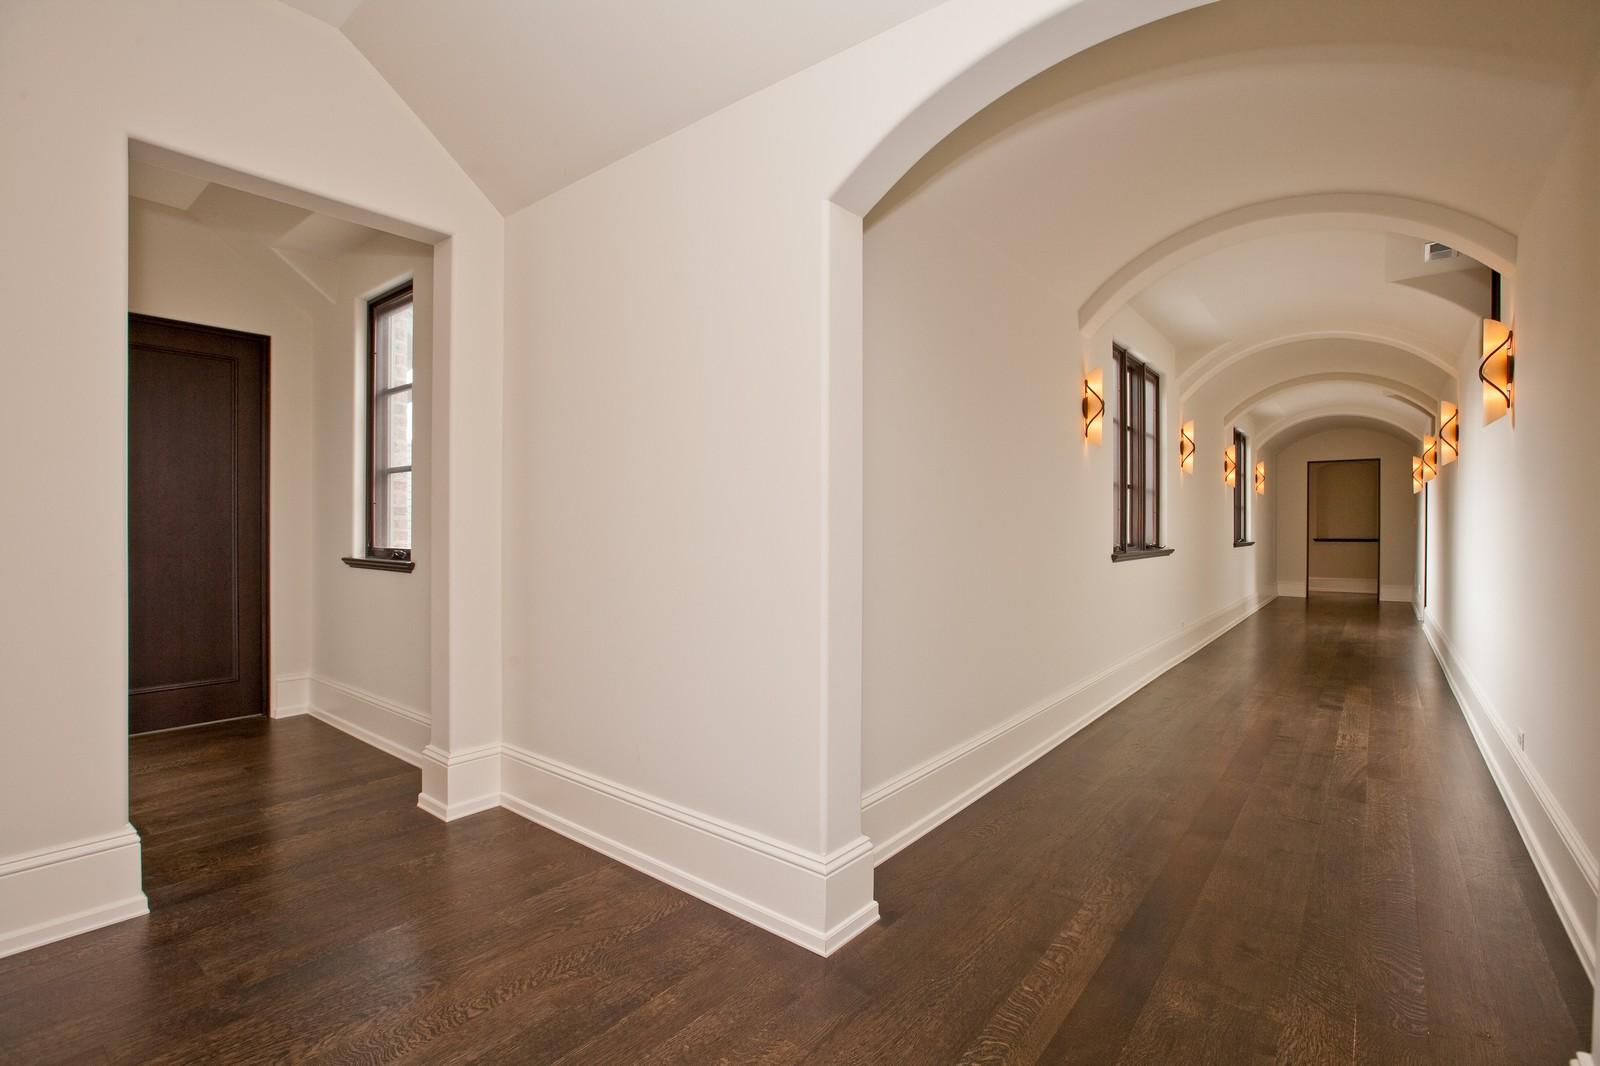 Real Estate Photography - 6143 Madison, Burr Ridge, IL, 60527 - Hallway